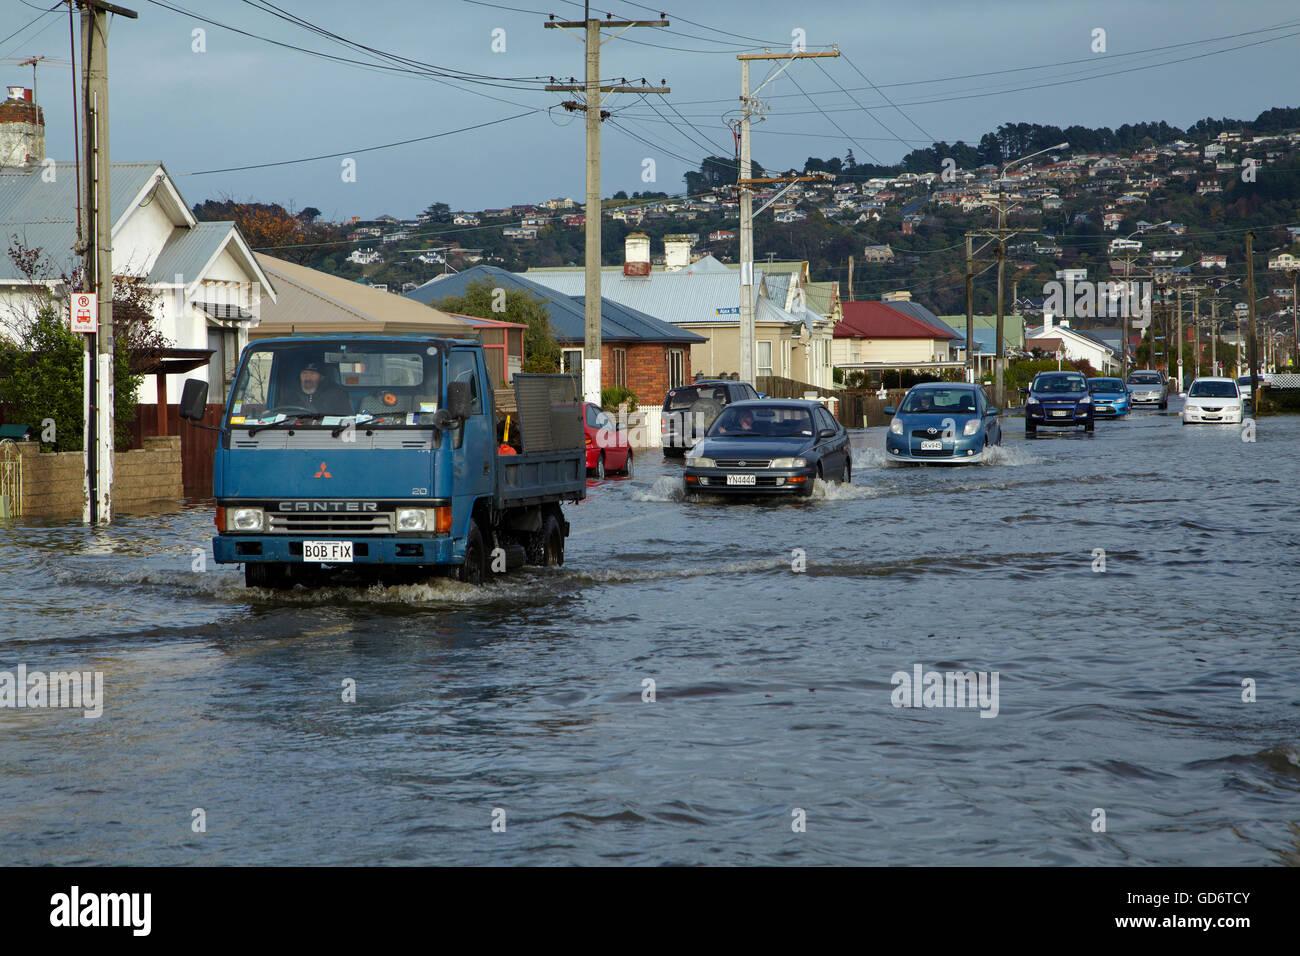 Traffic on flooded Bay View Road, South Dunedin floods, Dunedin, South Island, New Zealand Stock Photo